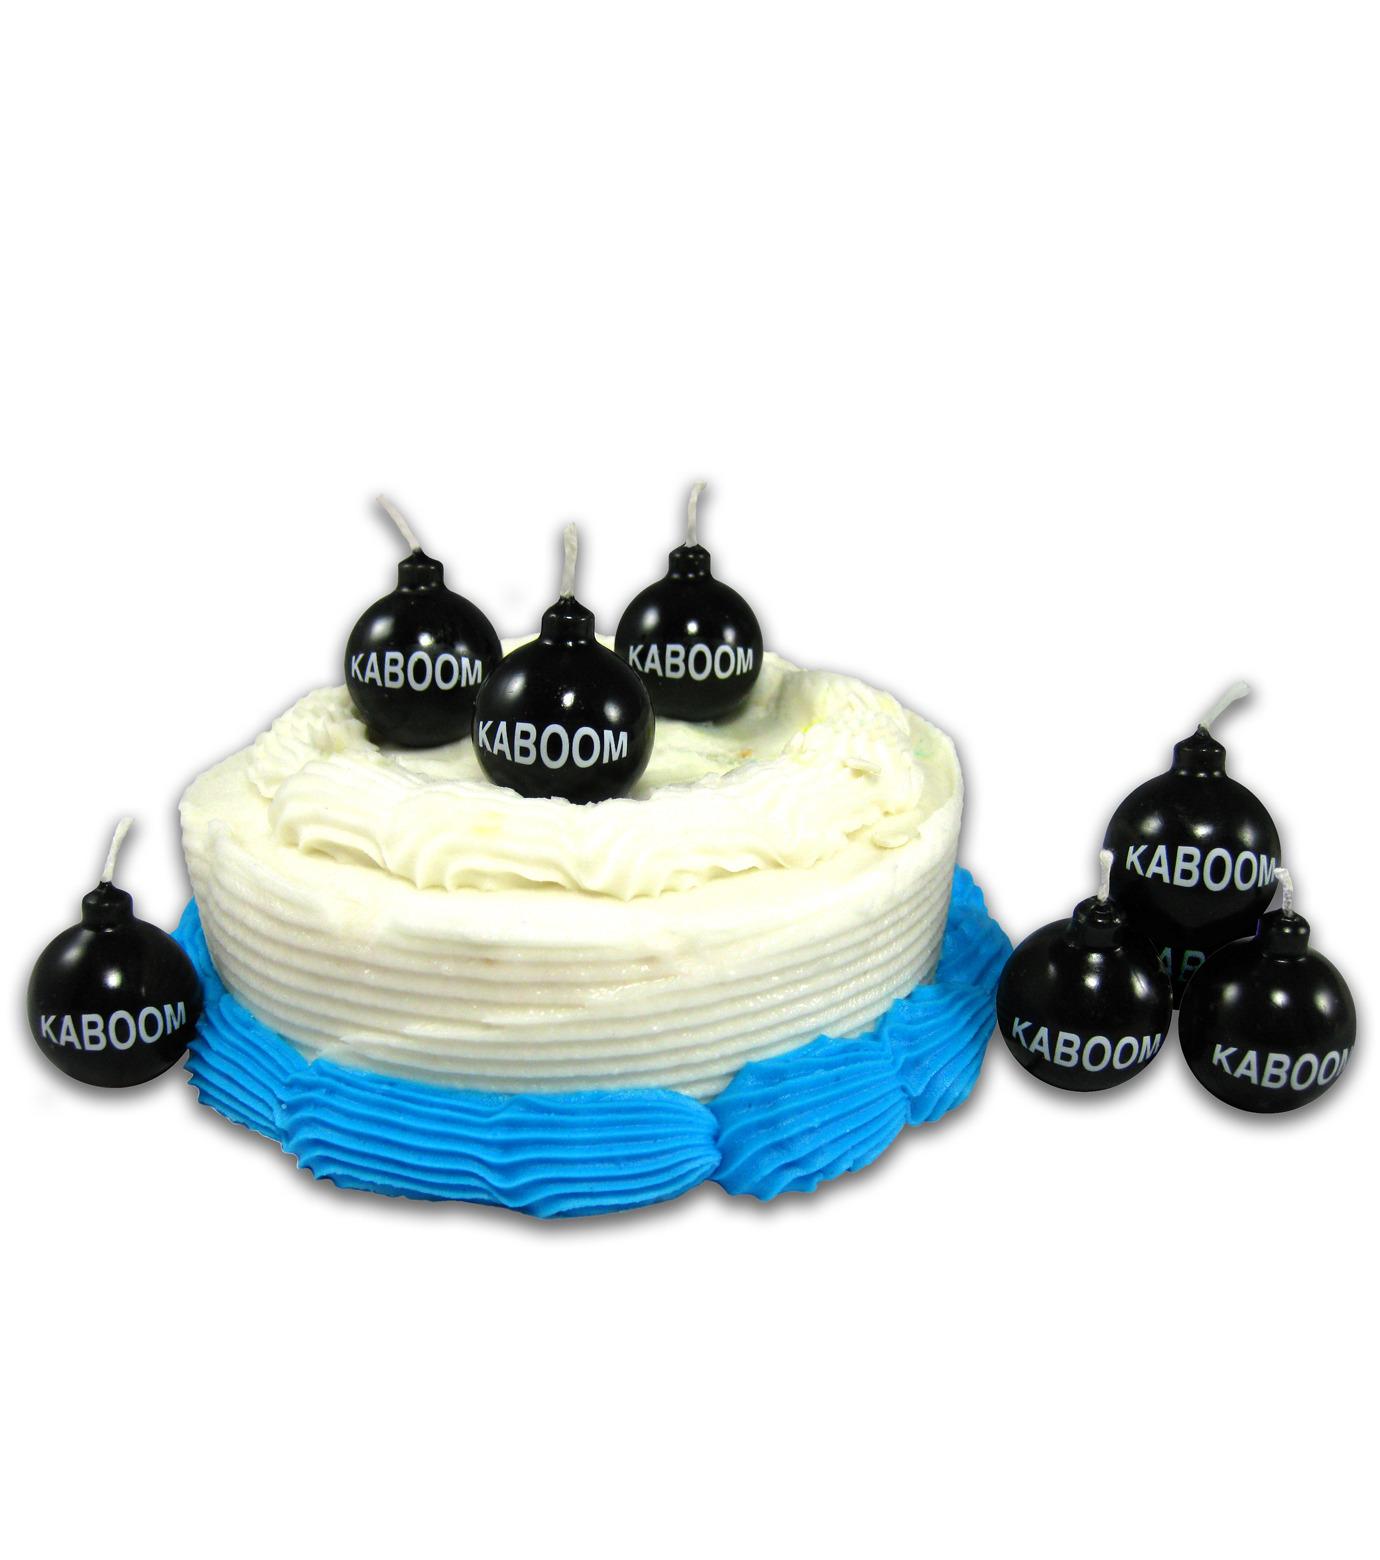 nuop design(ヌオップデザイン)のKaboom Candles-BLACK(キャンドル/candle)-KBM-13 拡大詳細画像1